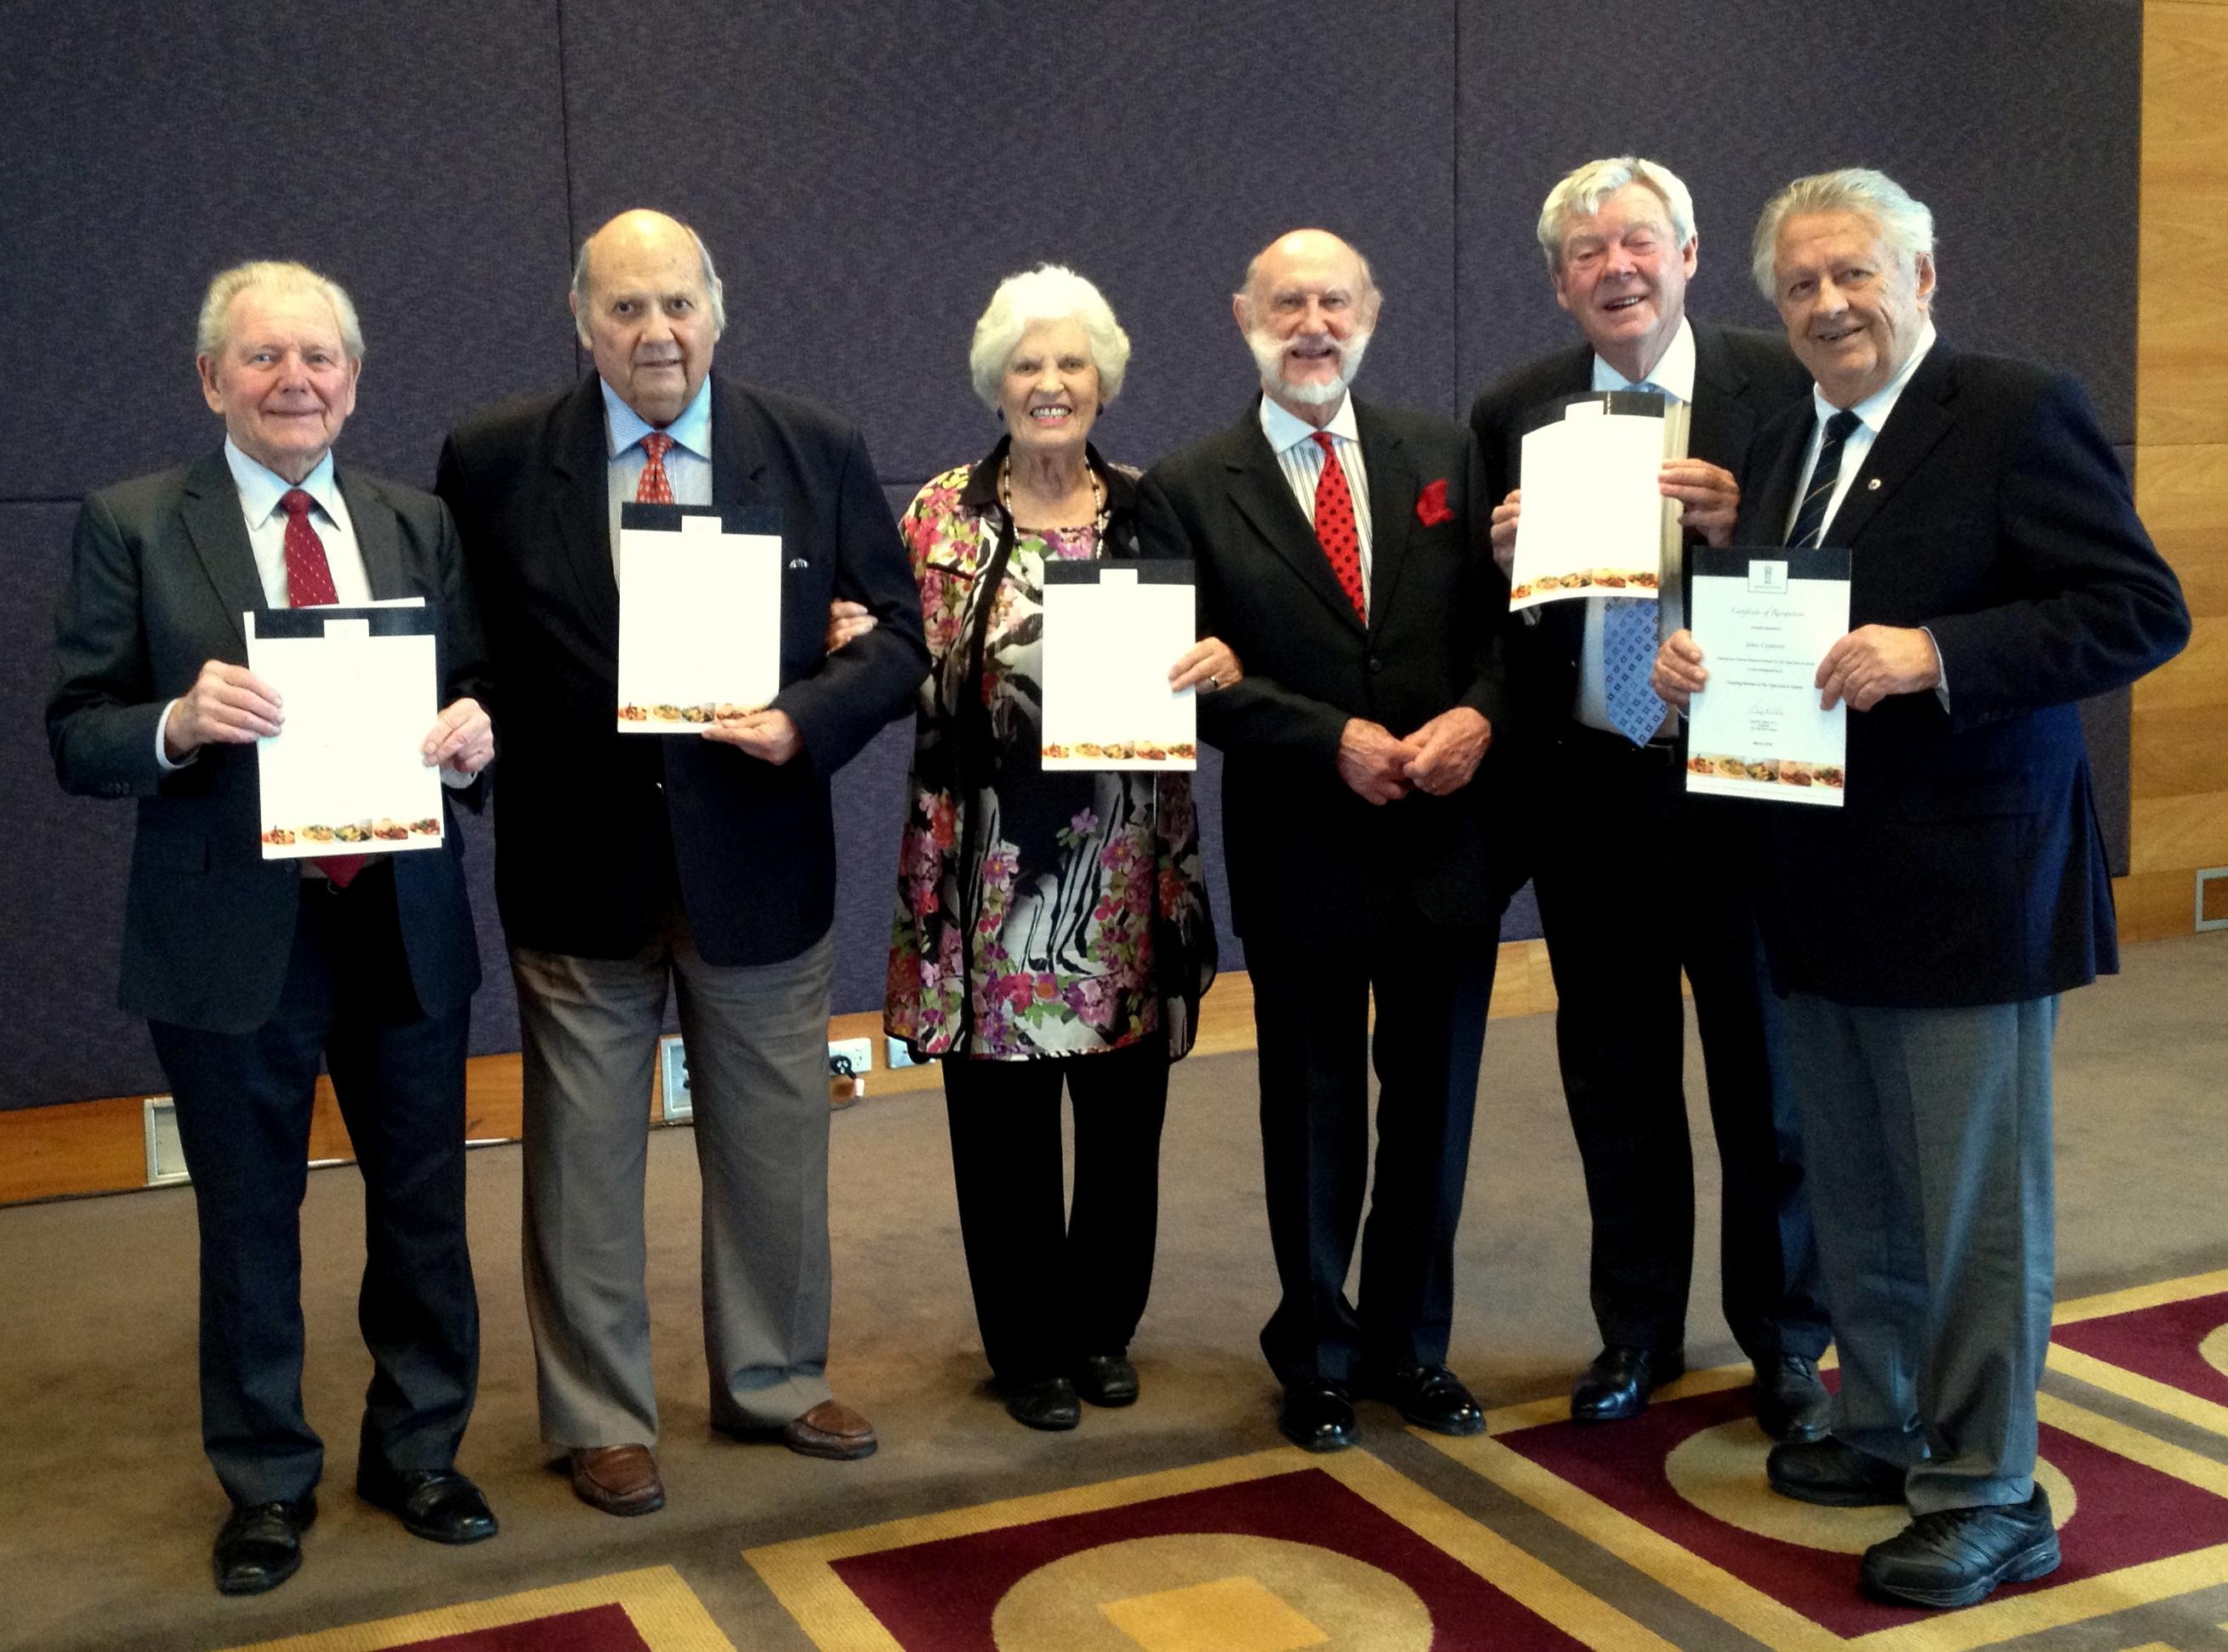 Foundation members